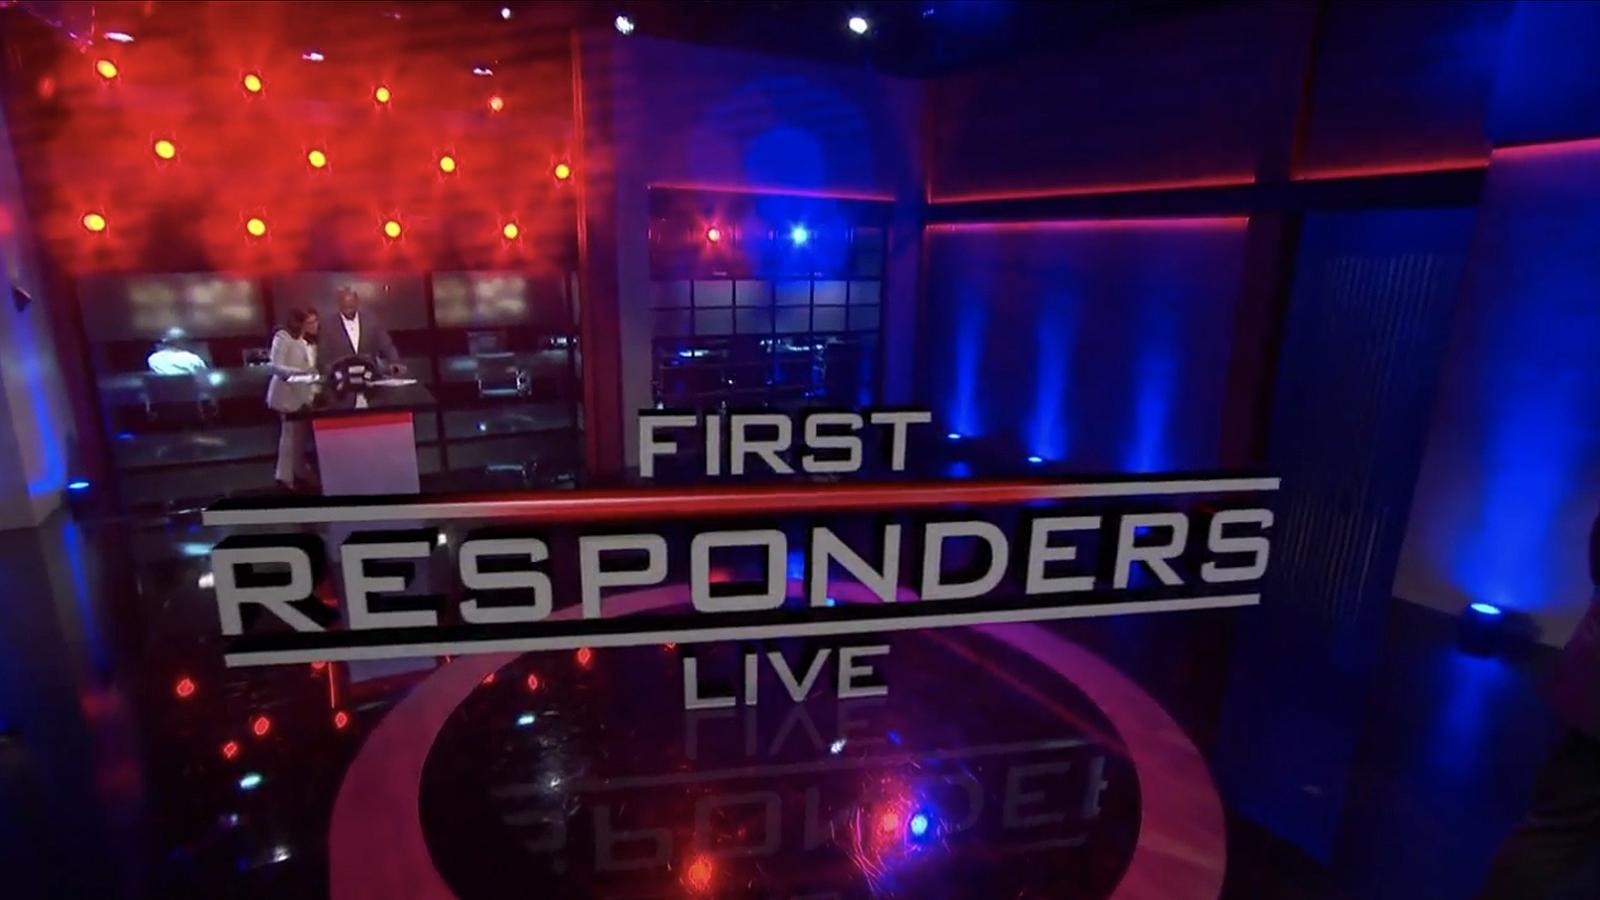 NCS_First-Responders-Live_Fox-AR-Set_0007